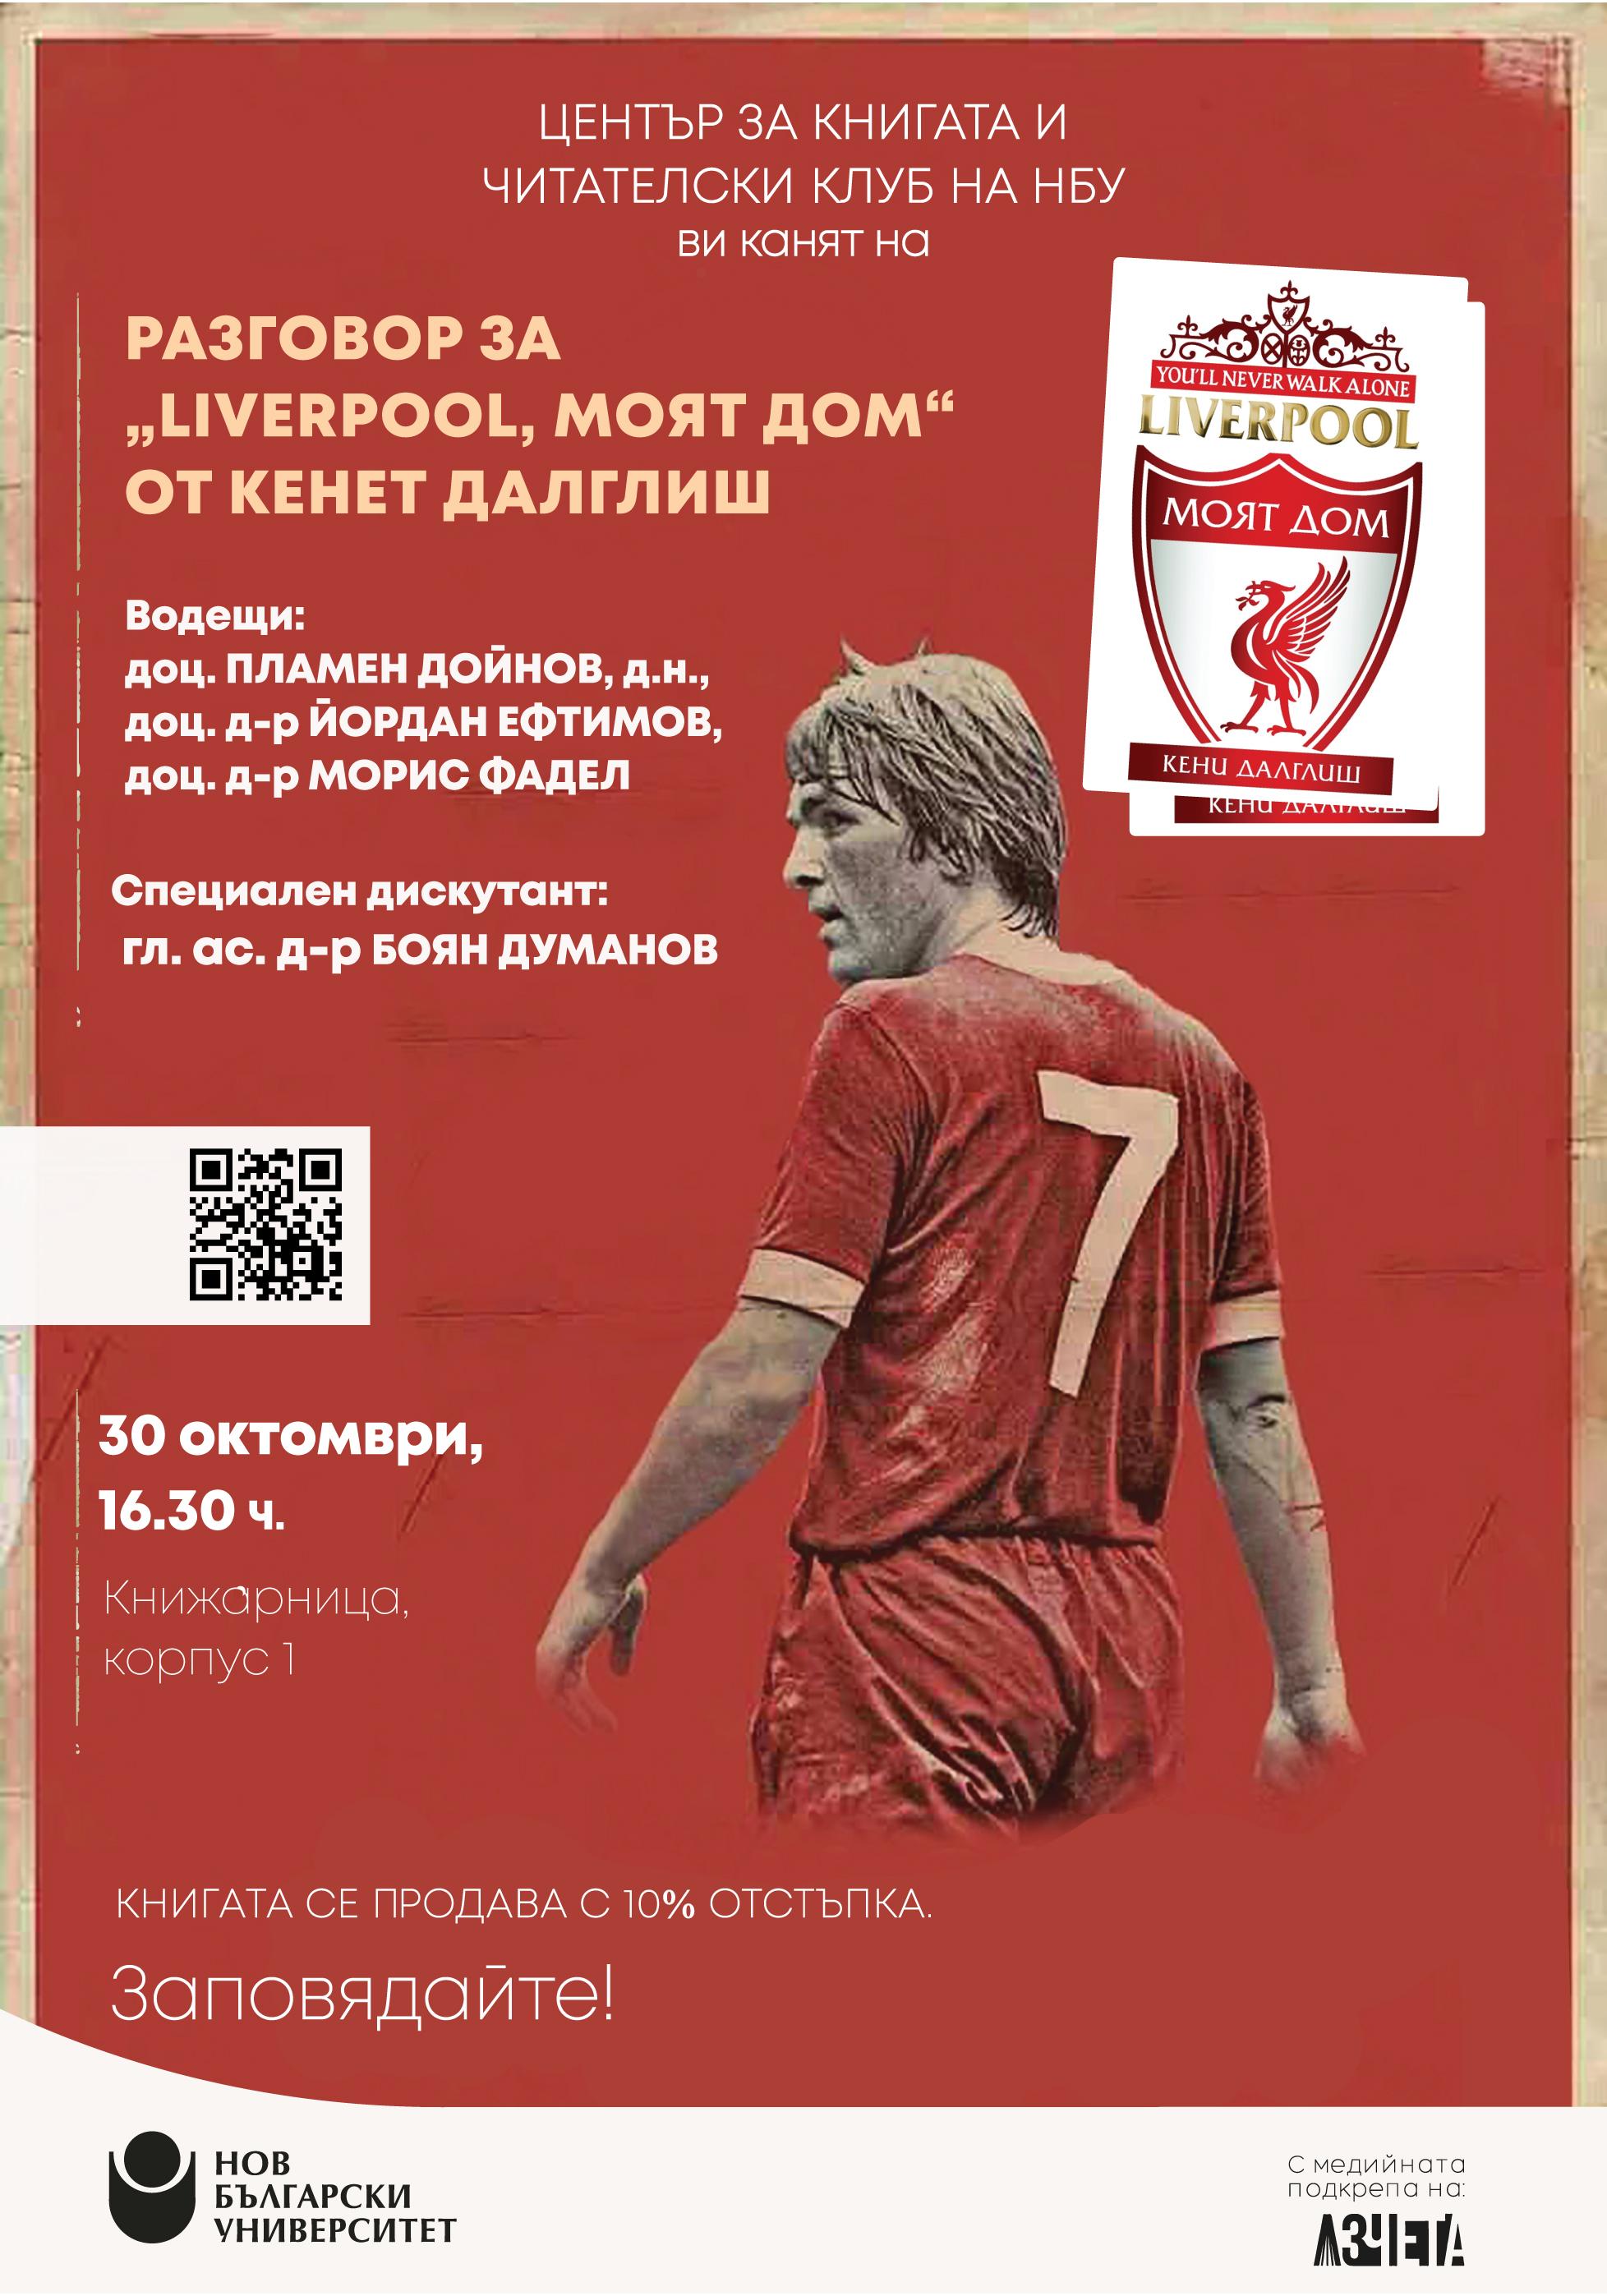 "Читателски клуб на НБУ: ""Liverpool, моят дом"" на Кенет Далглиш"